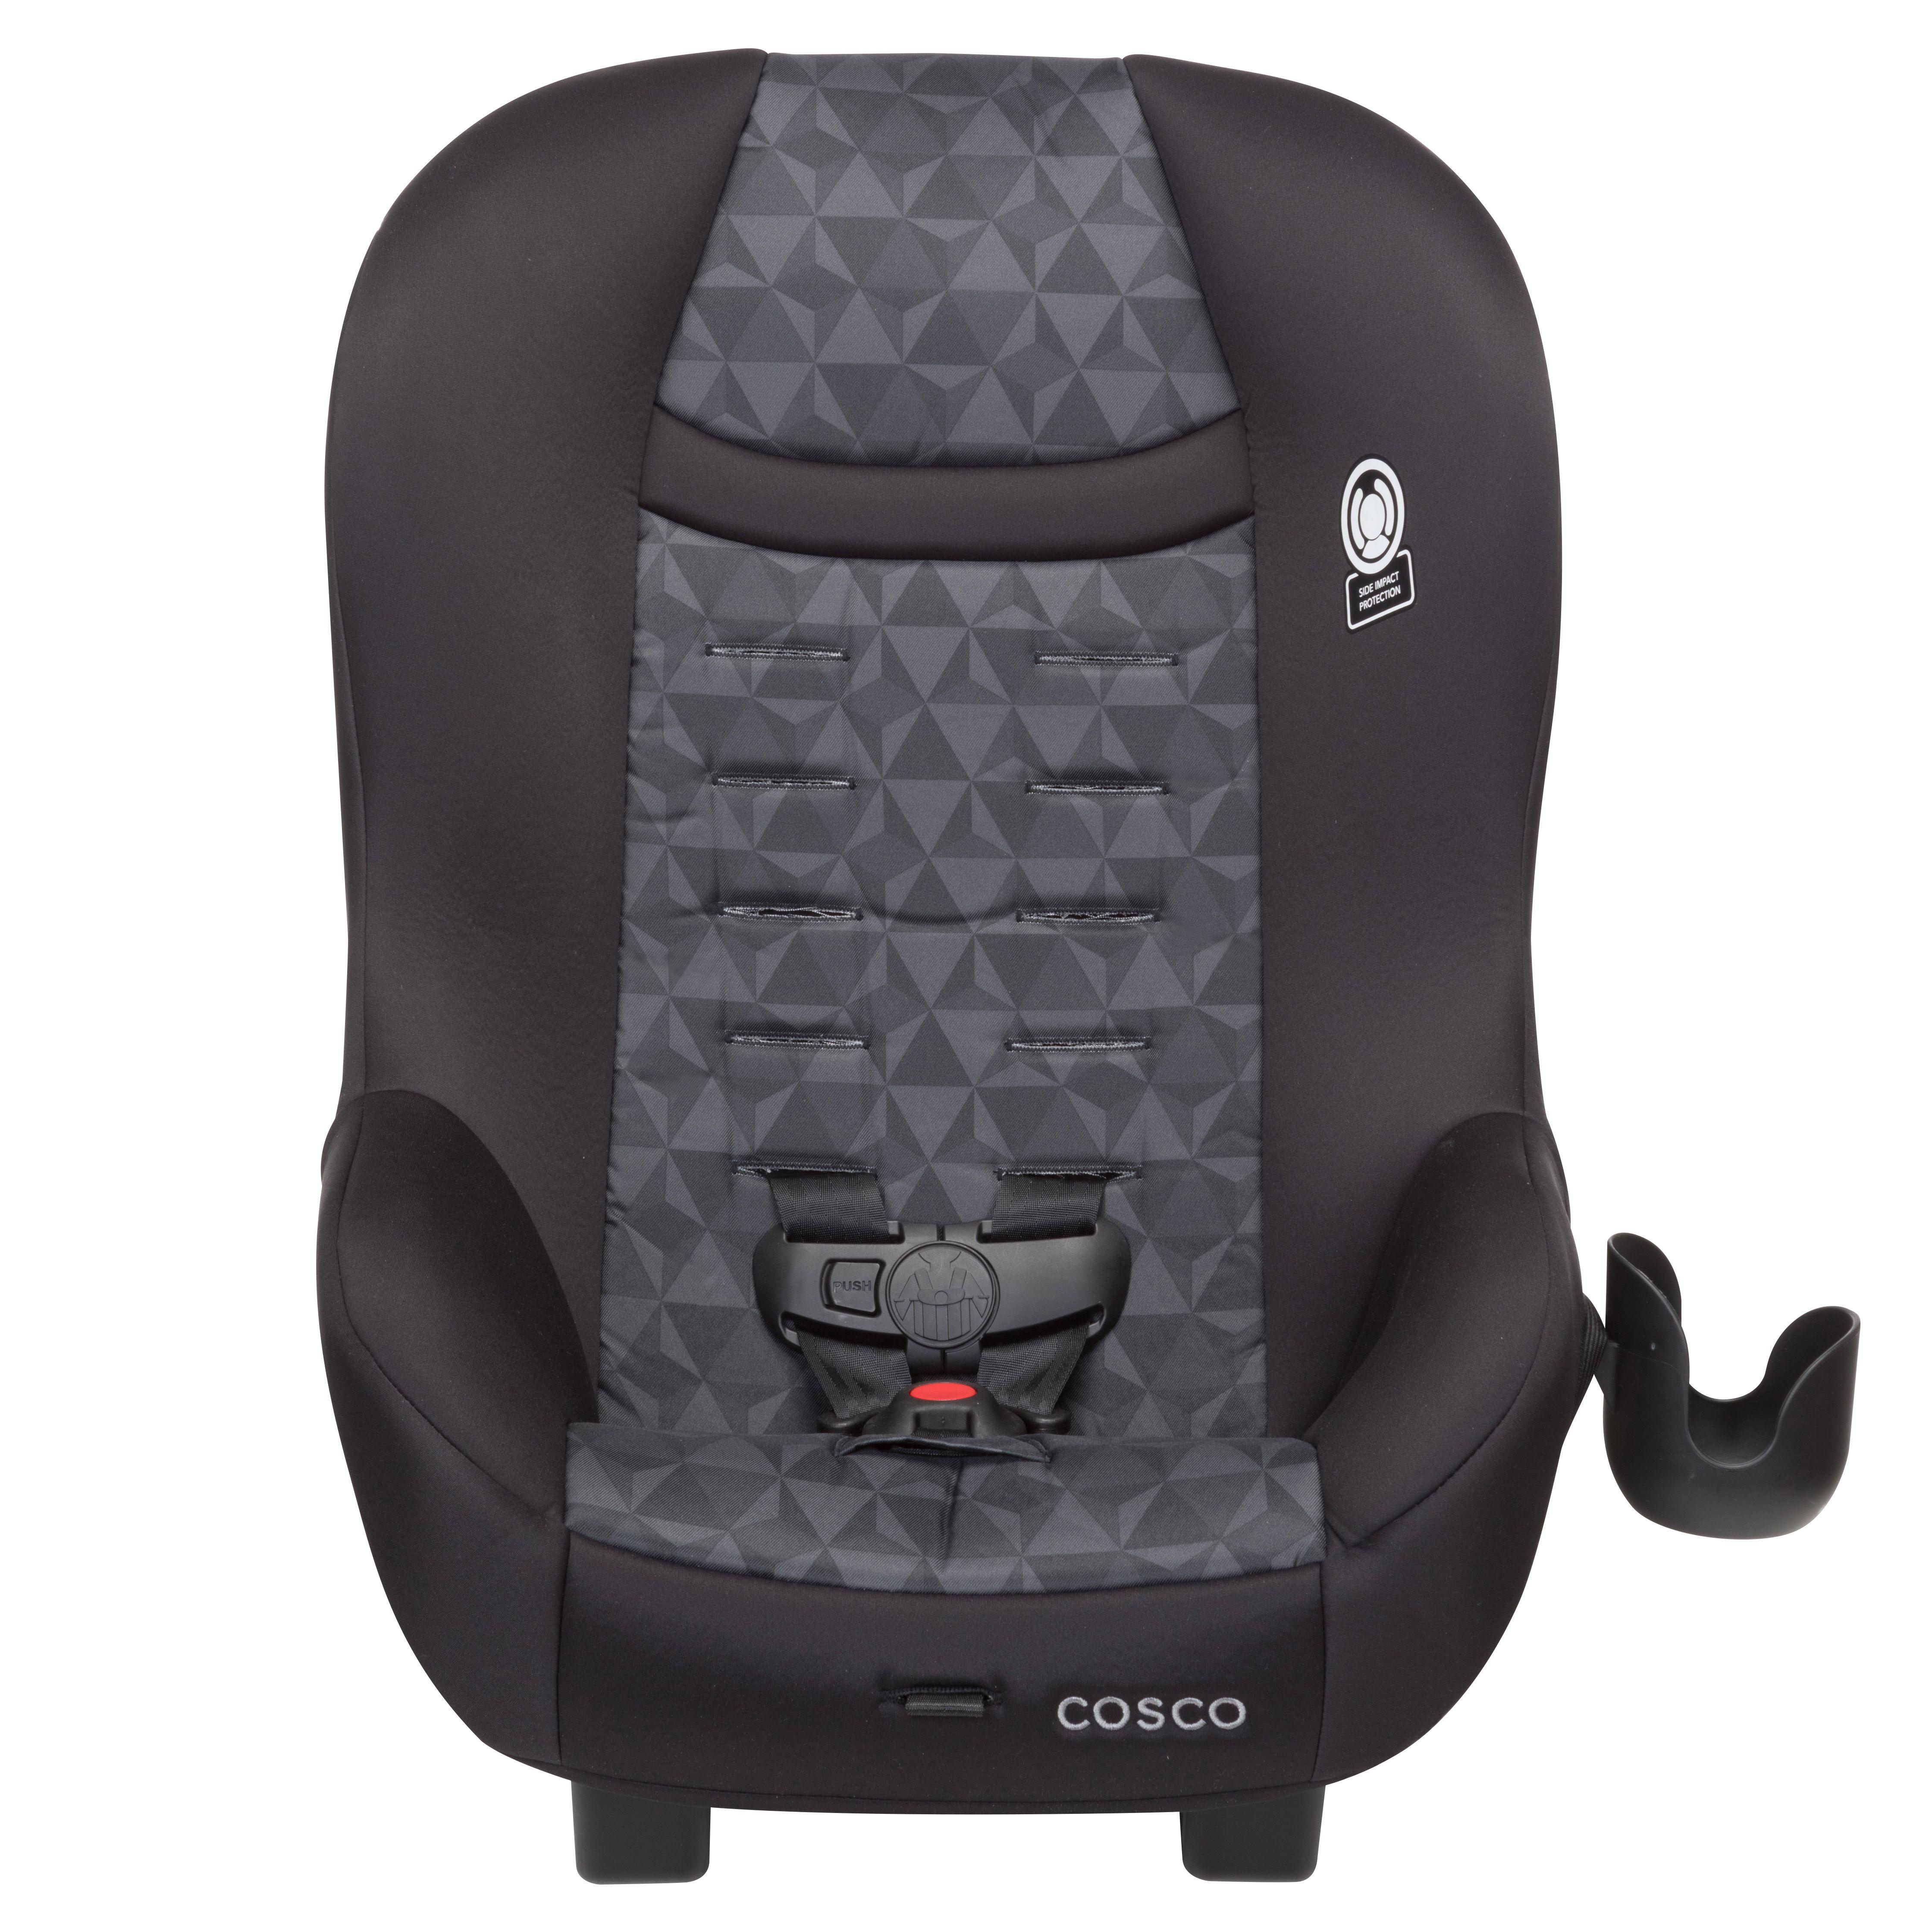 Cosco Scenera Next Girl S Car Seat Ad Scenera Affiliate Cosco Girl In 2020 Car Seats Car Seat Girl Car Seat Pad,Bathroom Decorating Ideas